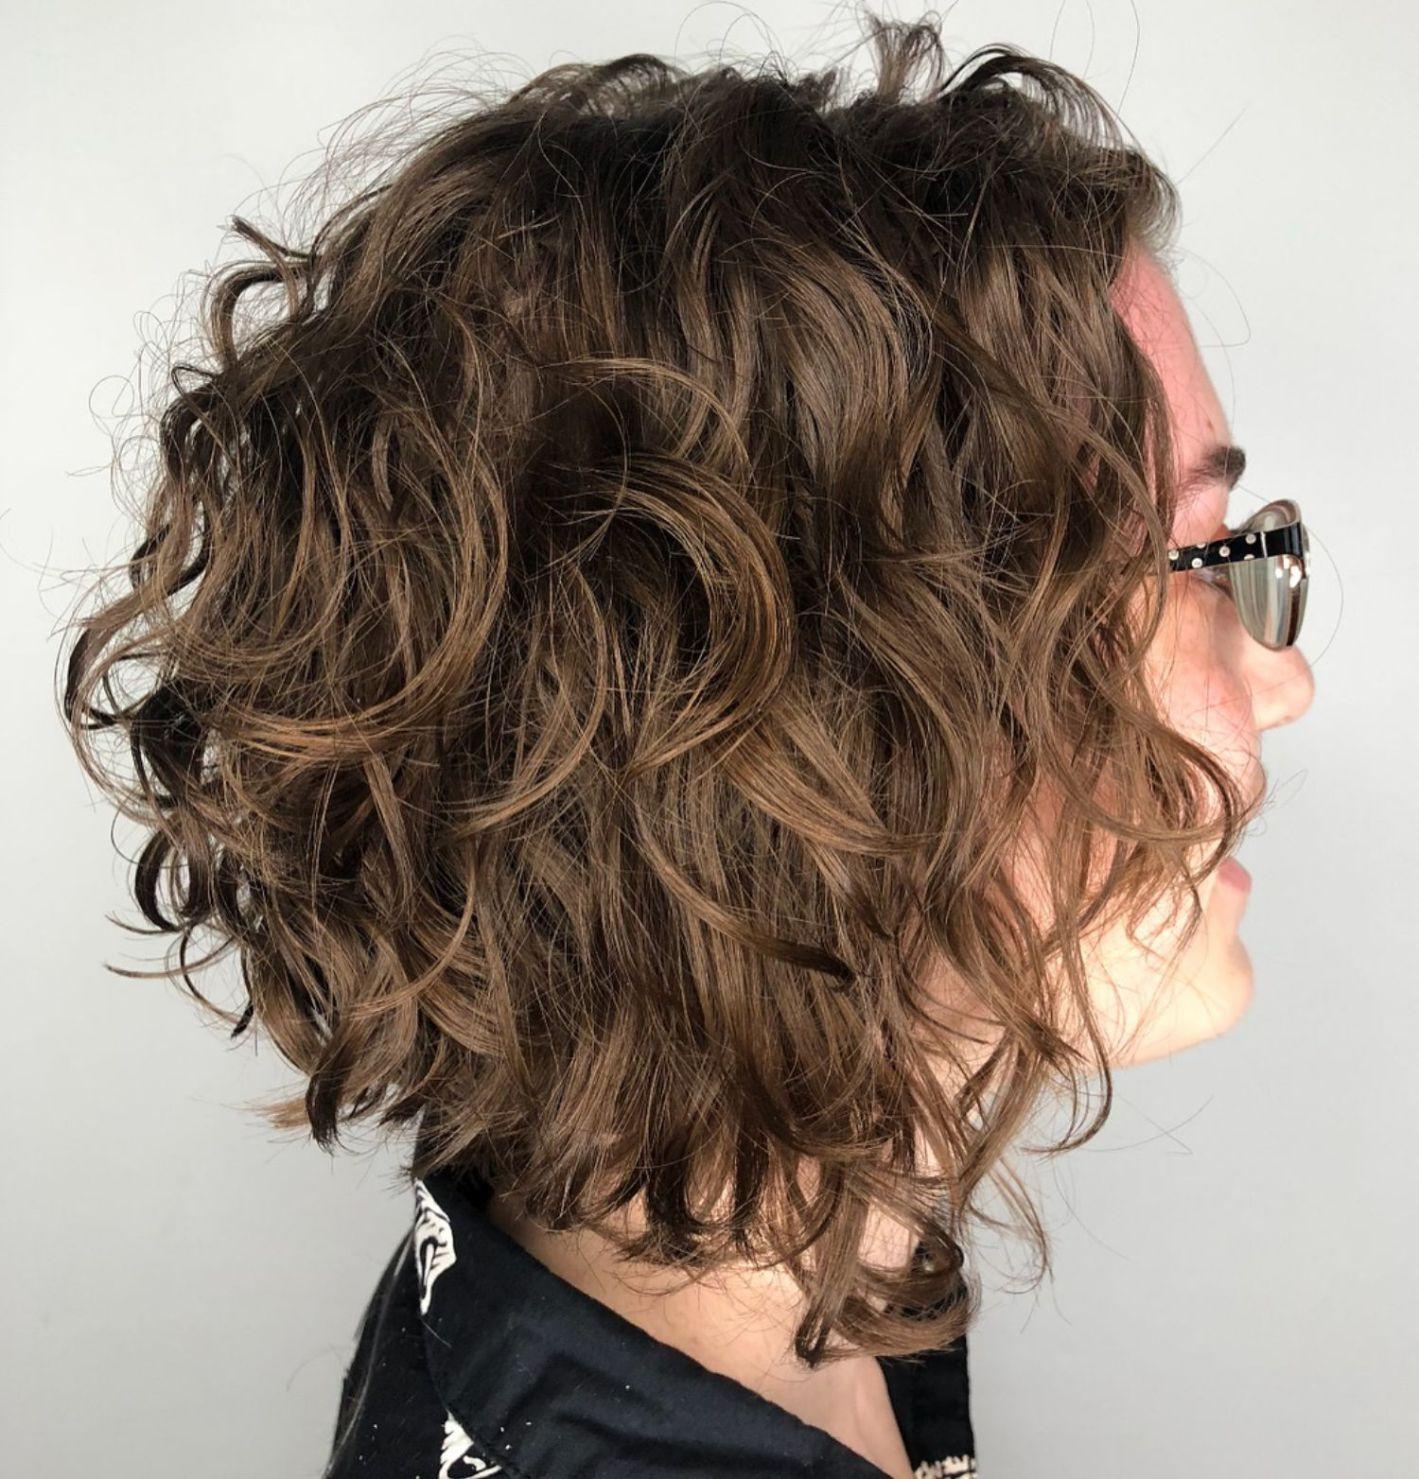 34+ Medium curly bob hairstyles information